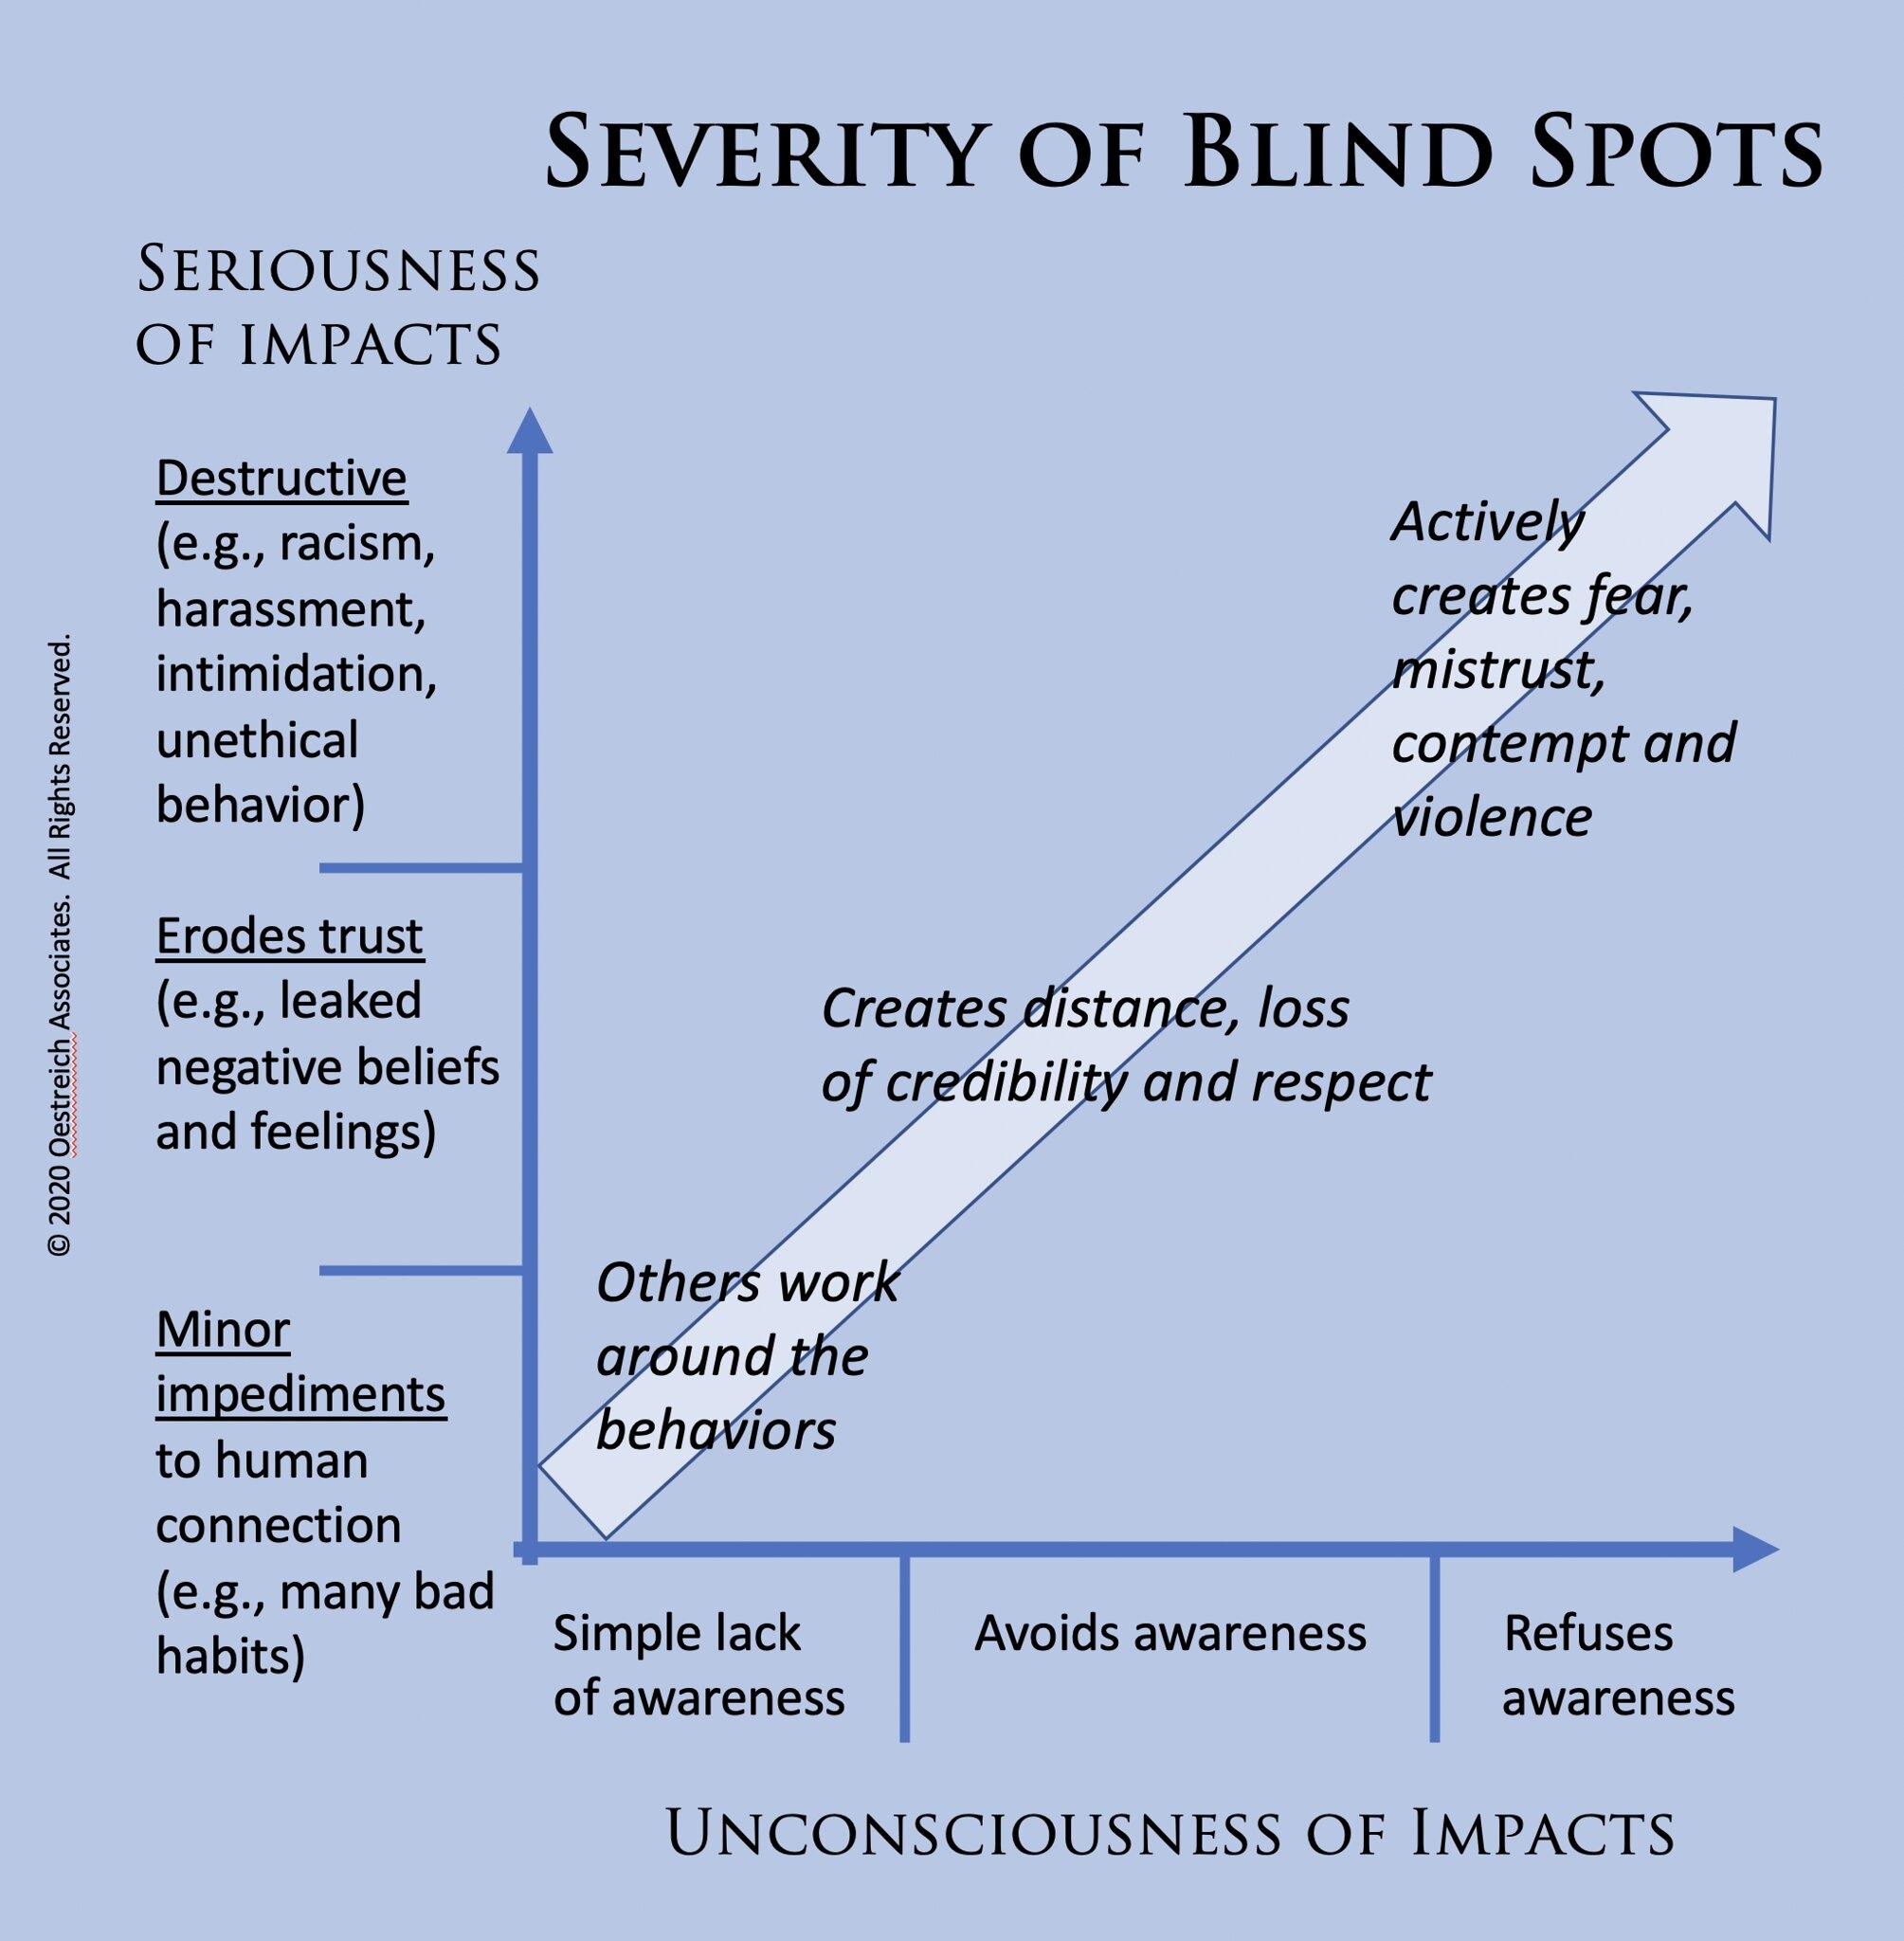 Severity of Blind Spots